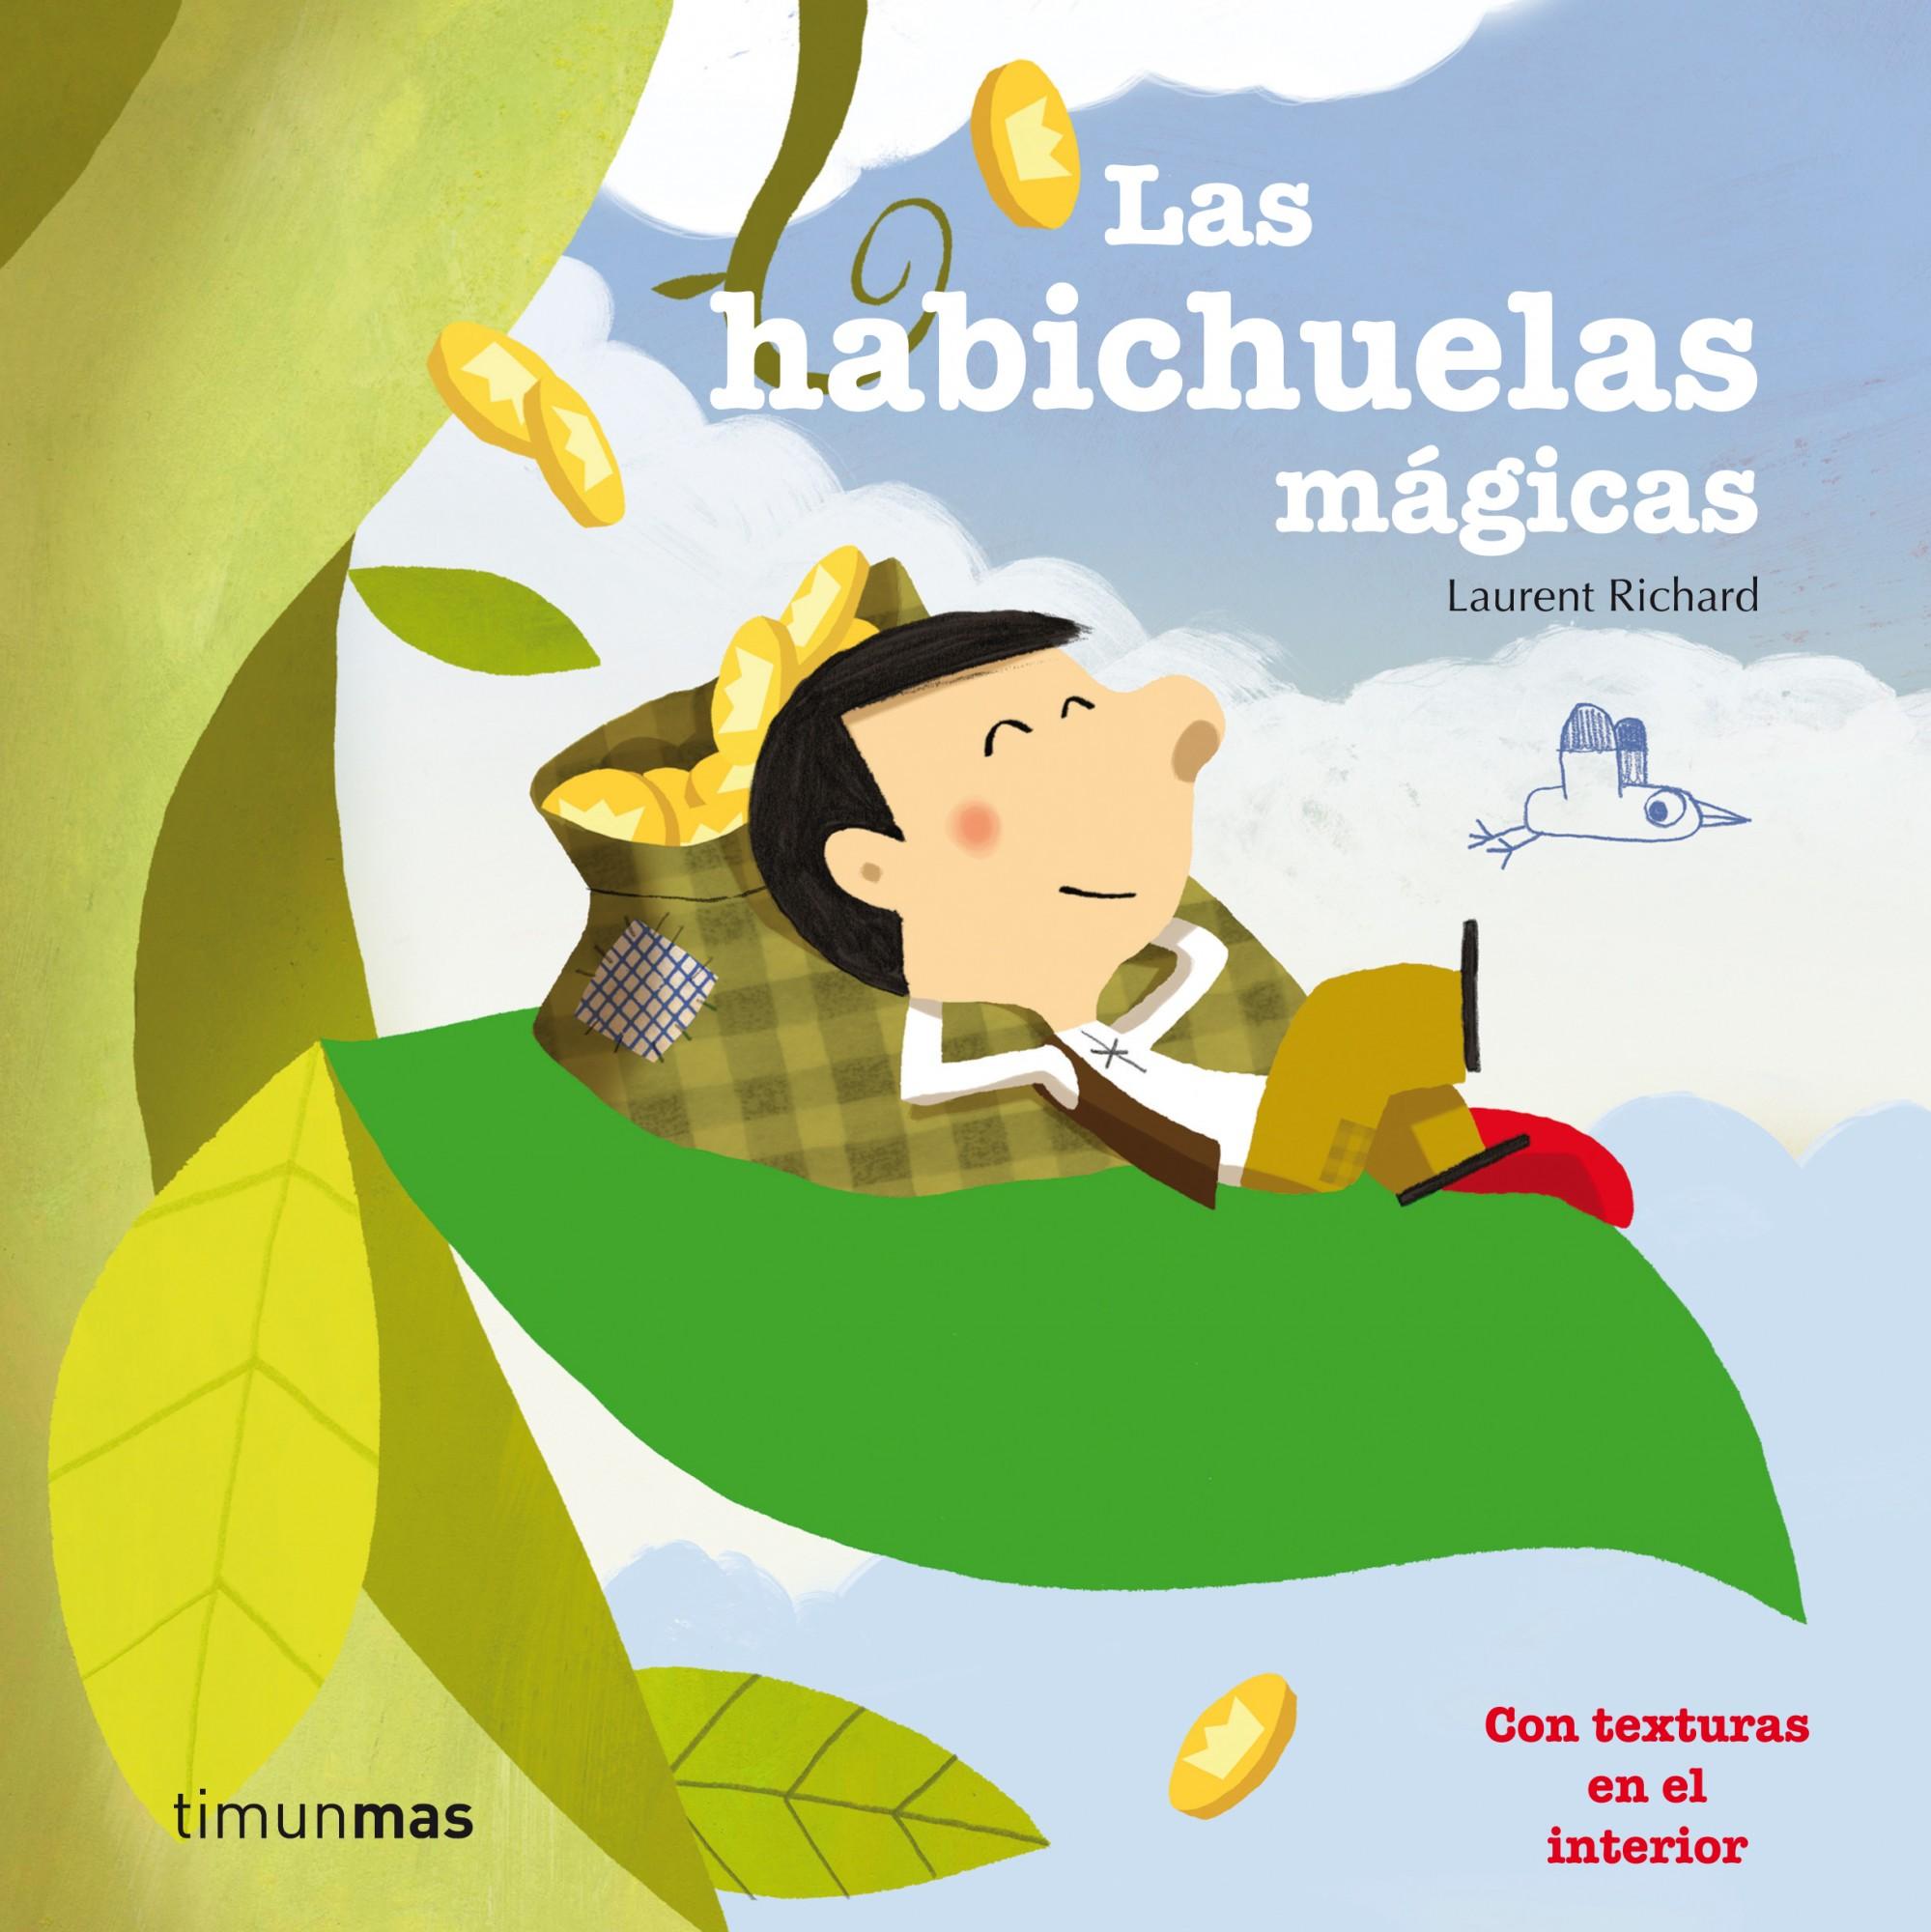 libros infantiles timun mas